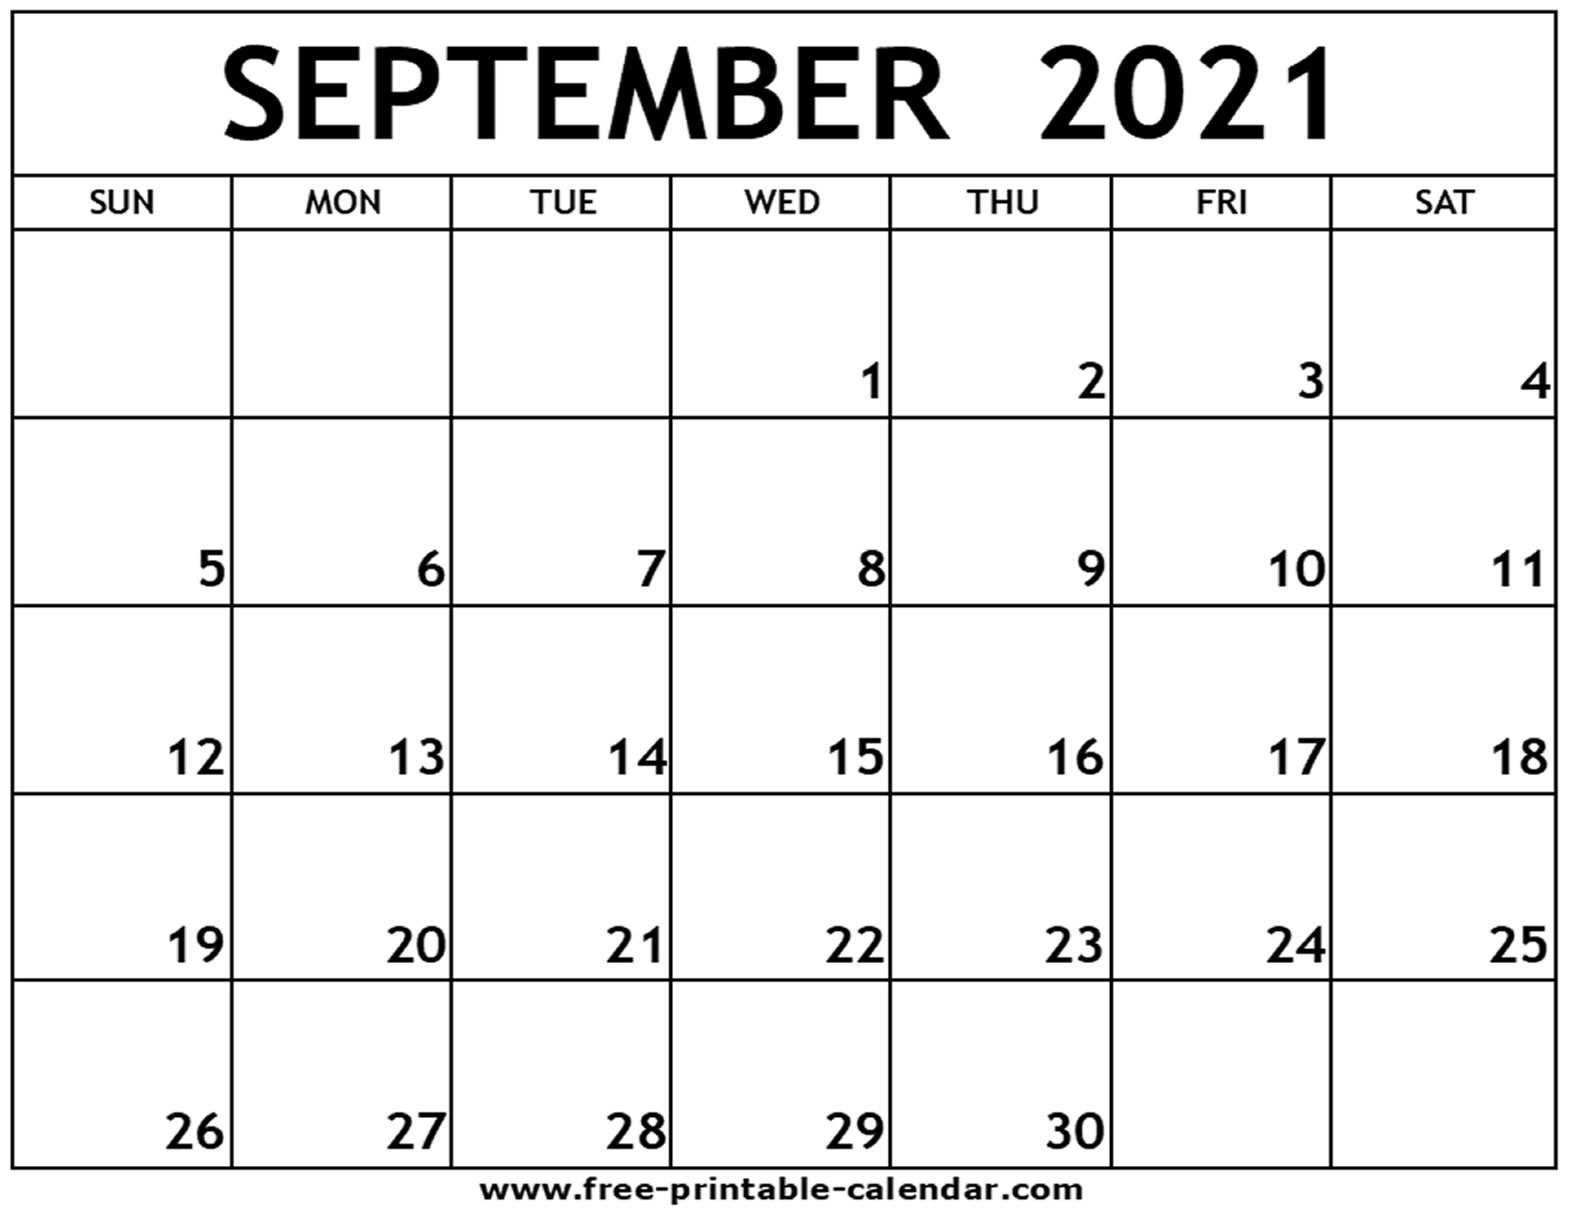 Catch September 2021 Calendar Printable Free Template